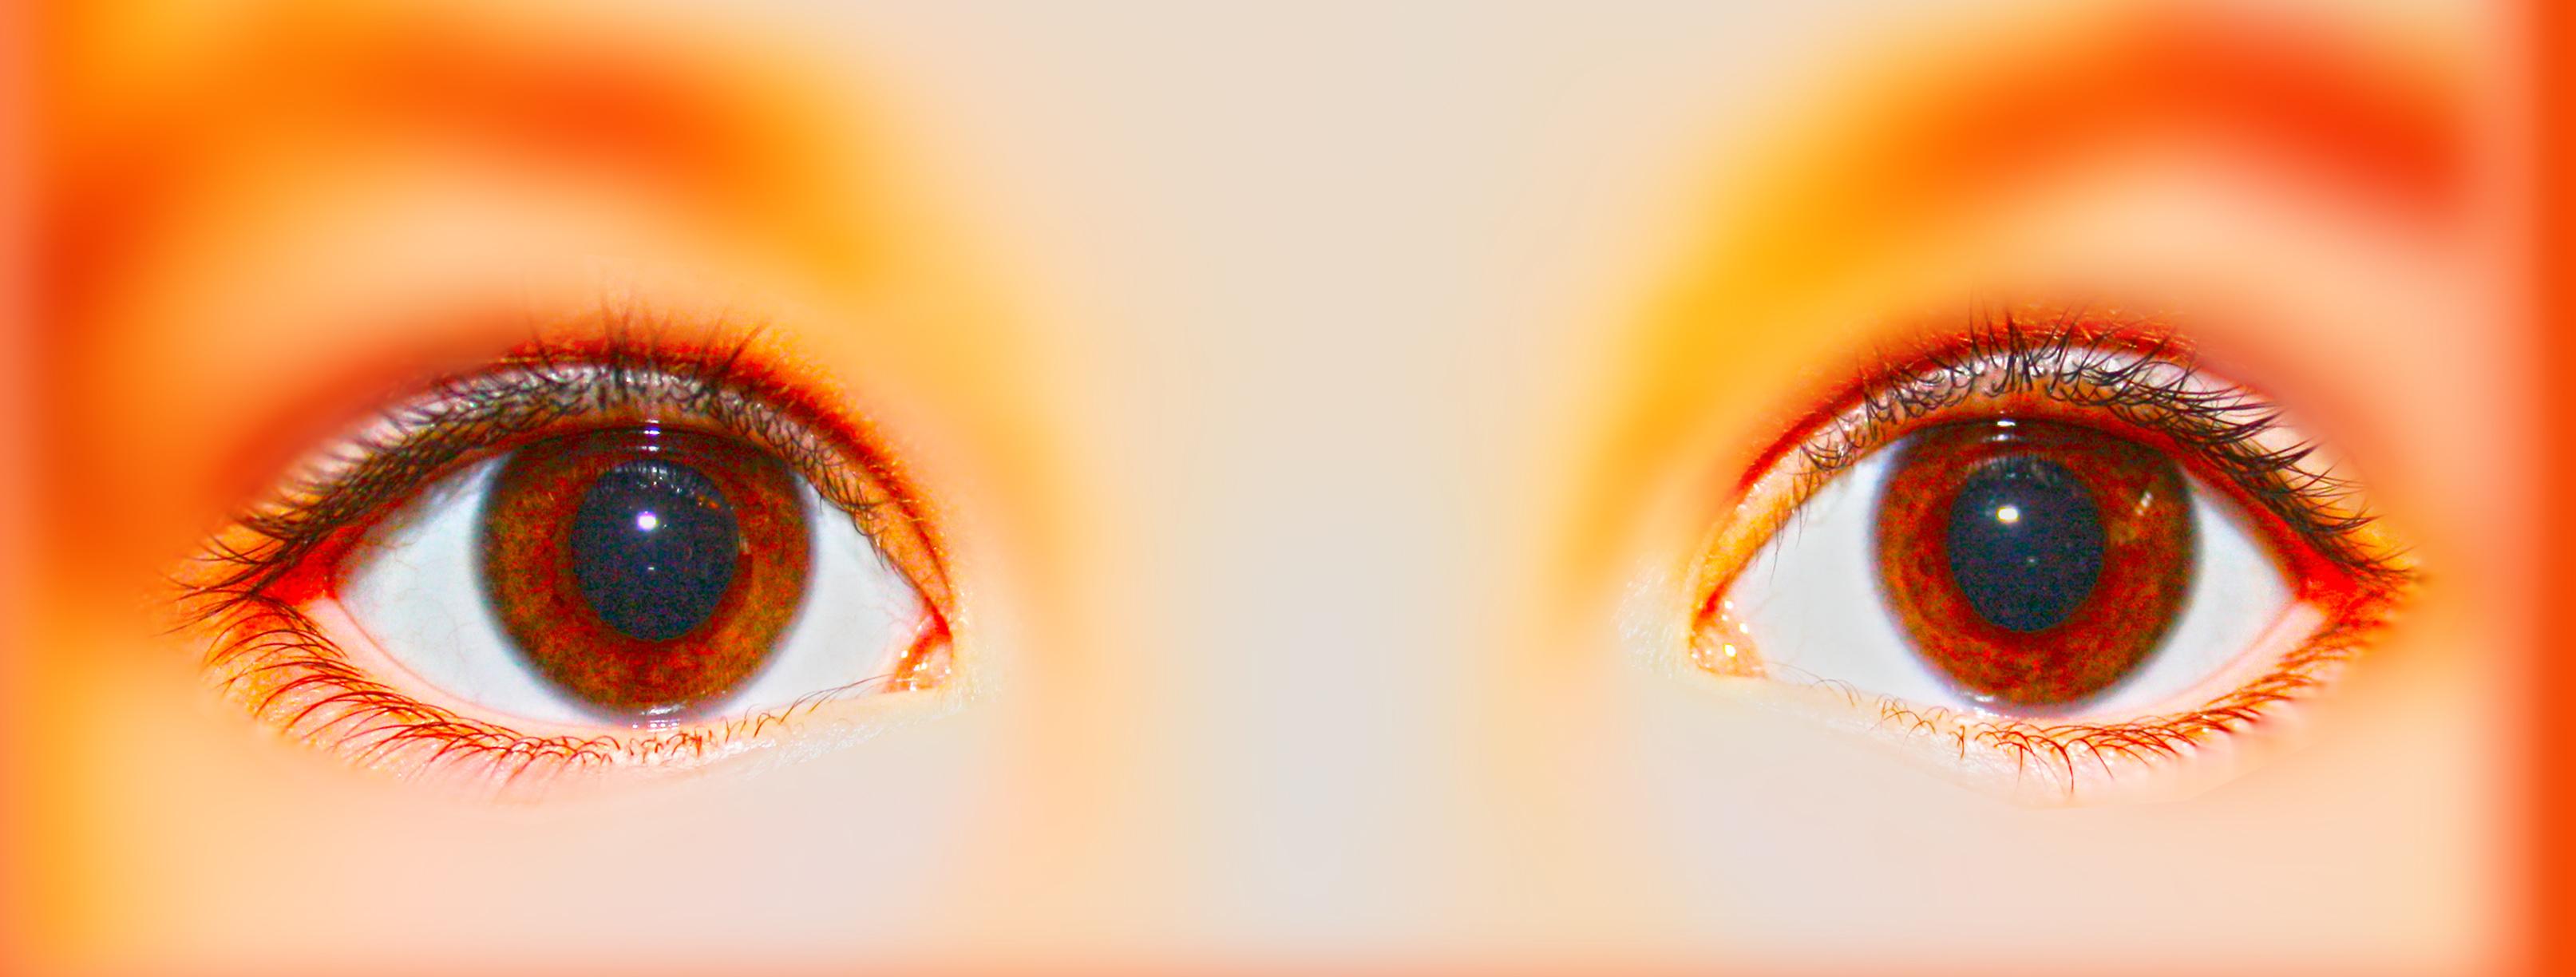 Need some Fresh Eyes?